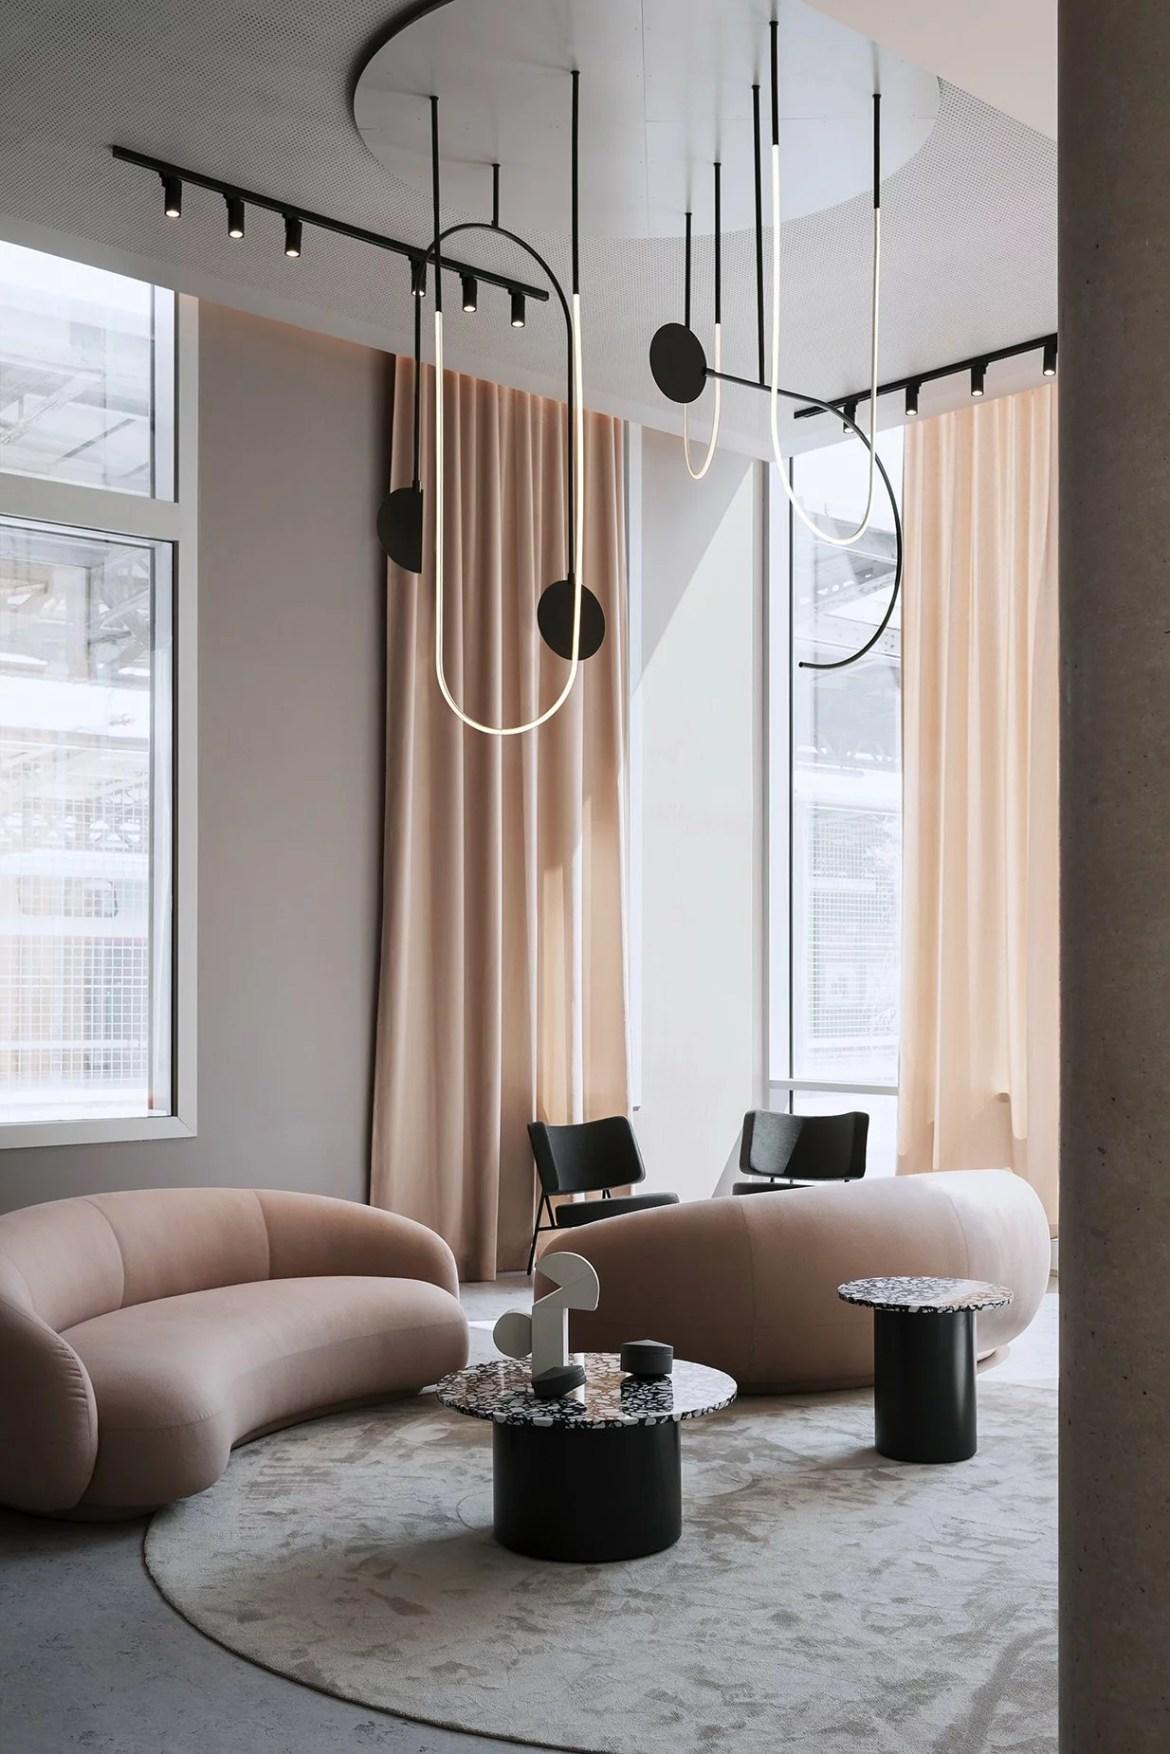 OKKO Hotel Paris by Studiopepepe